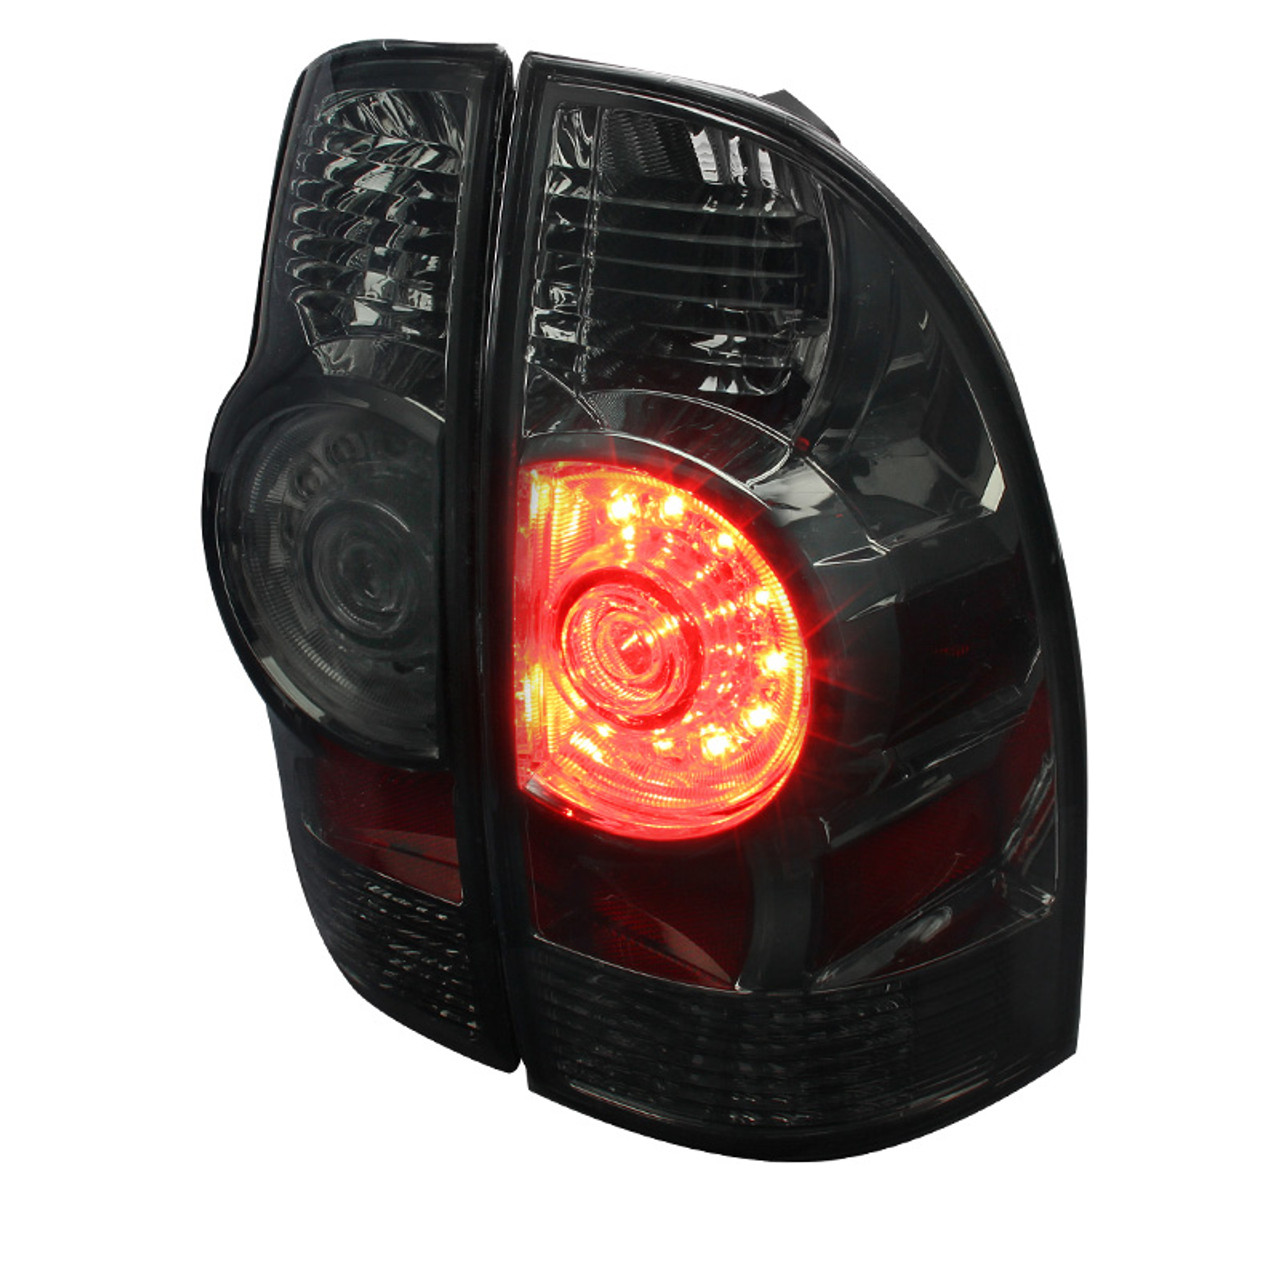 Spec-D Tuning LT-TAC09CLED-RS Chrome Tail Light Led